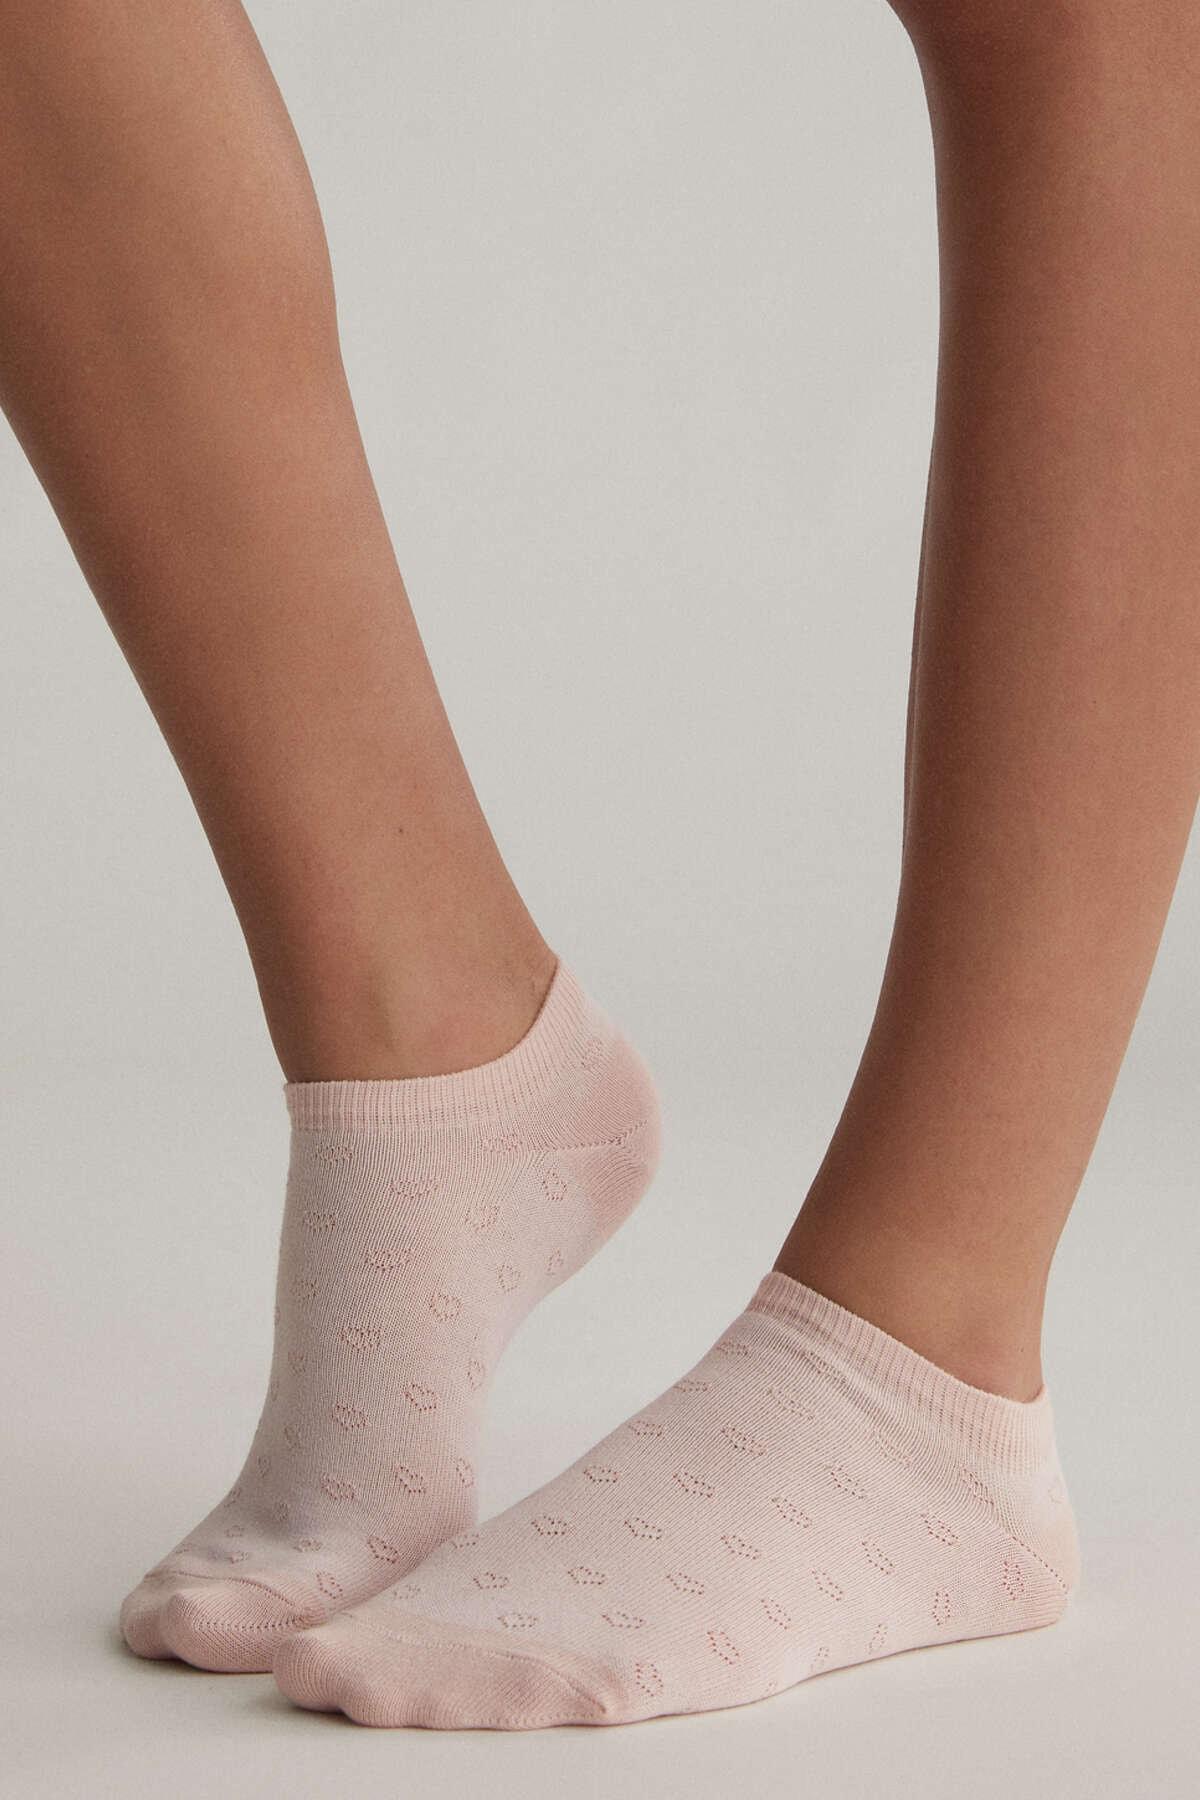 Oysho Kadın 5 Çift Desenli Pamuklu Bilek Boyu Çorap Pembe 32289488